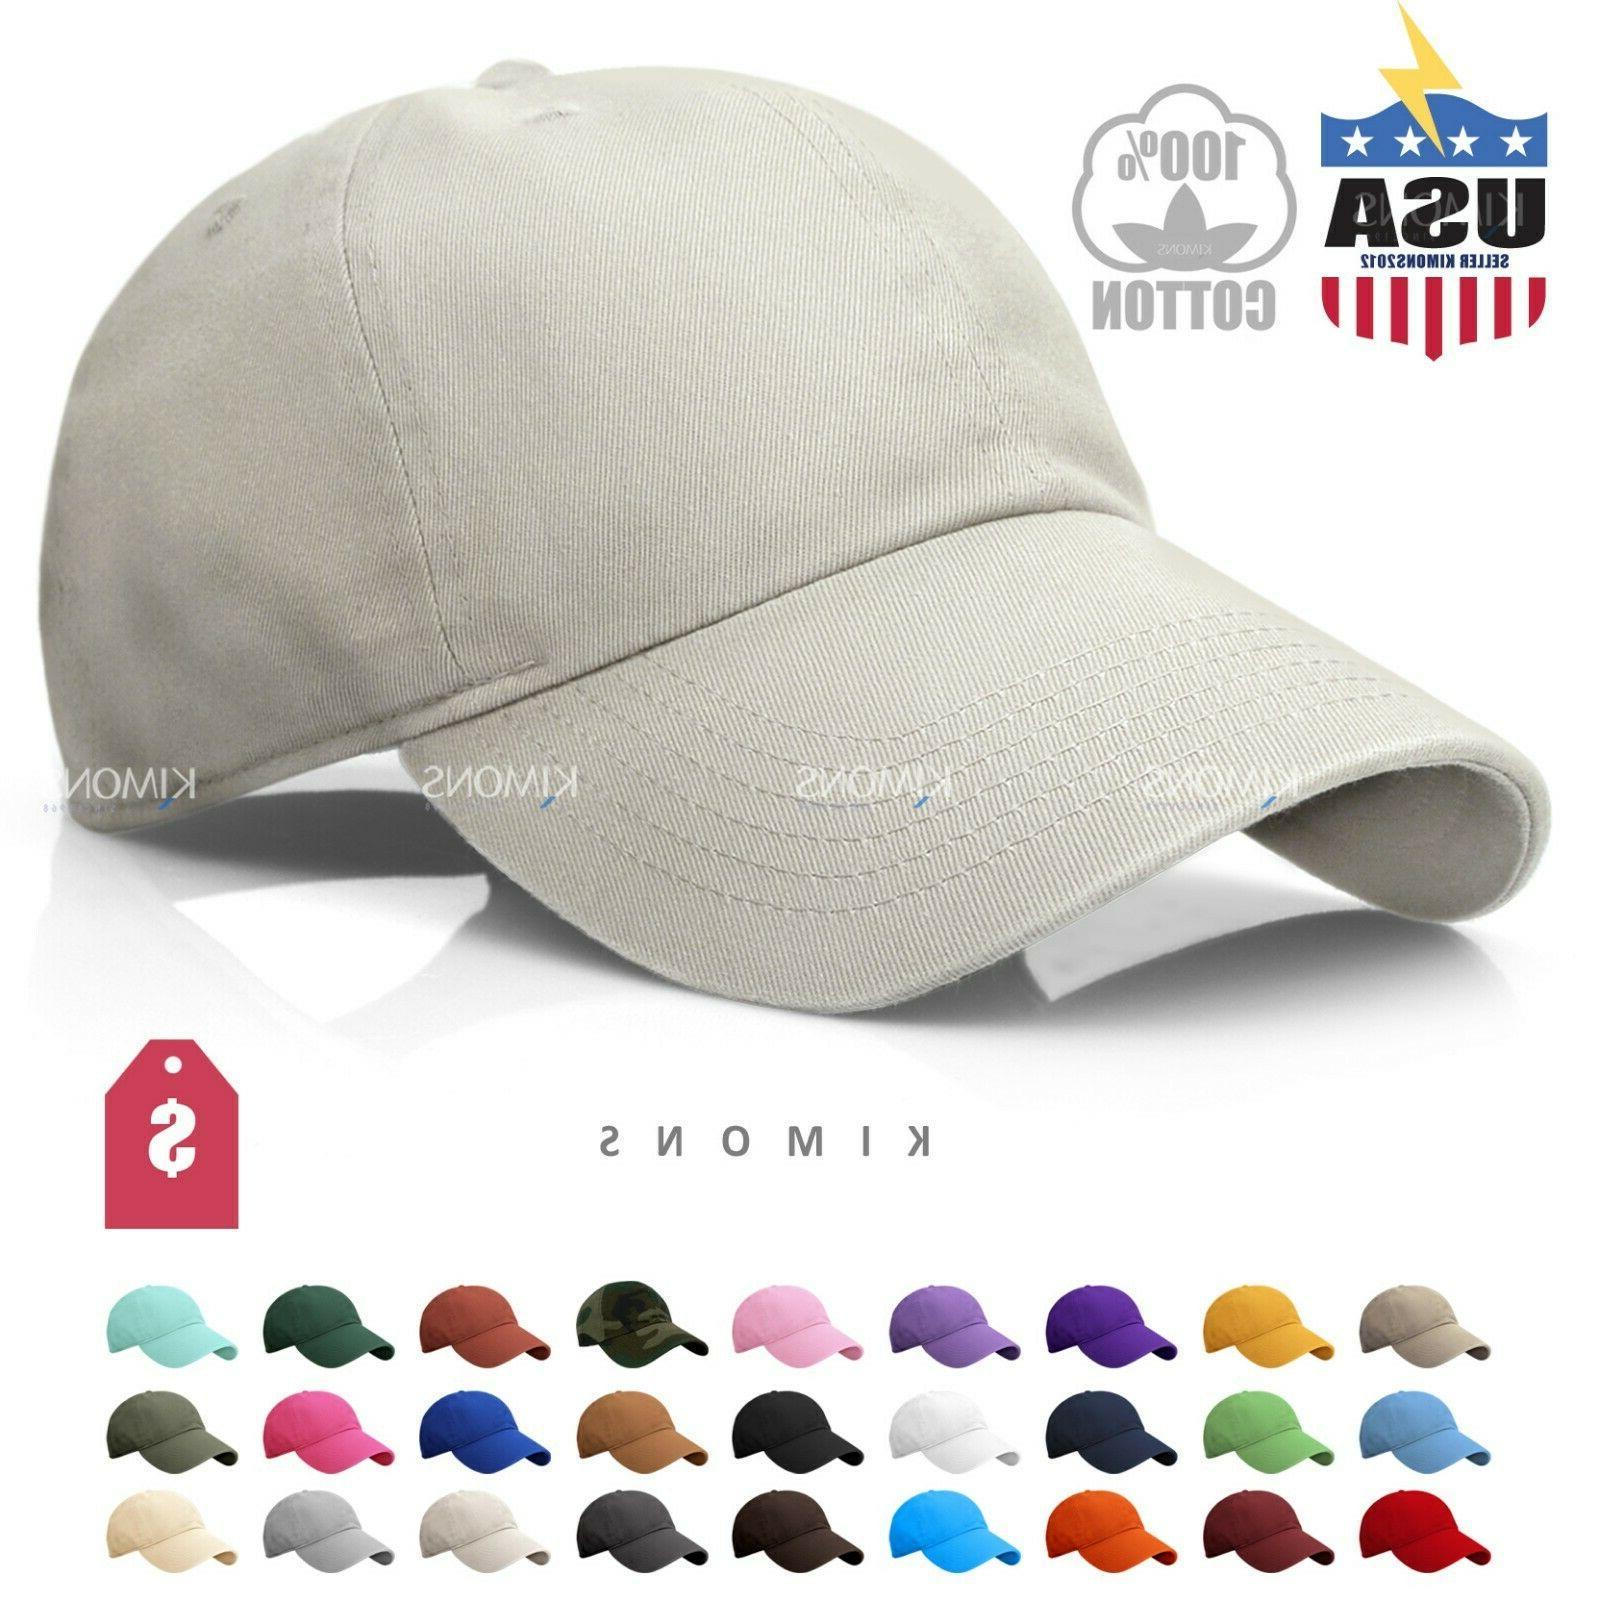 polo style baseball cap ball dad hat